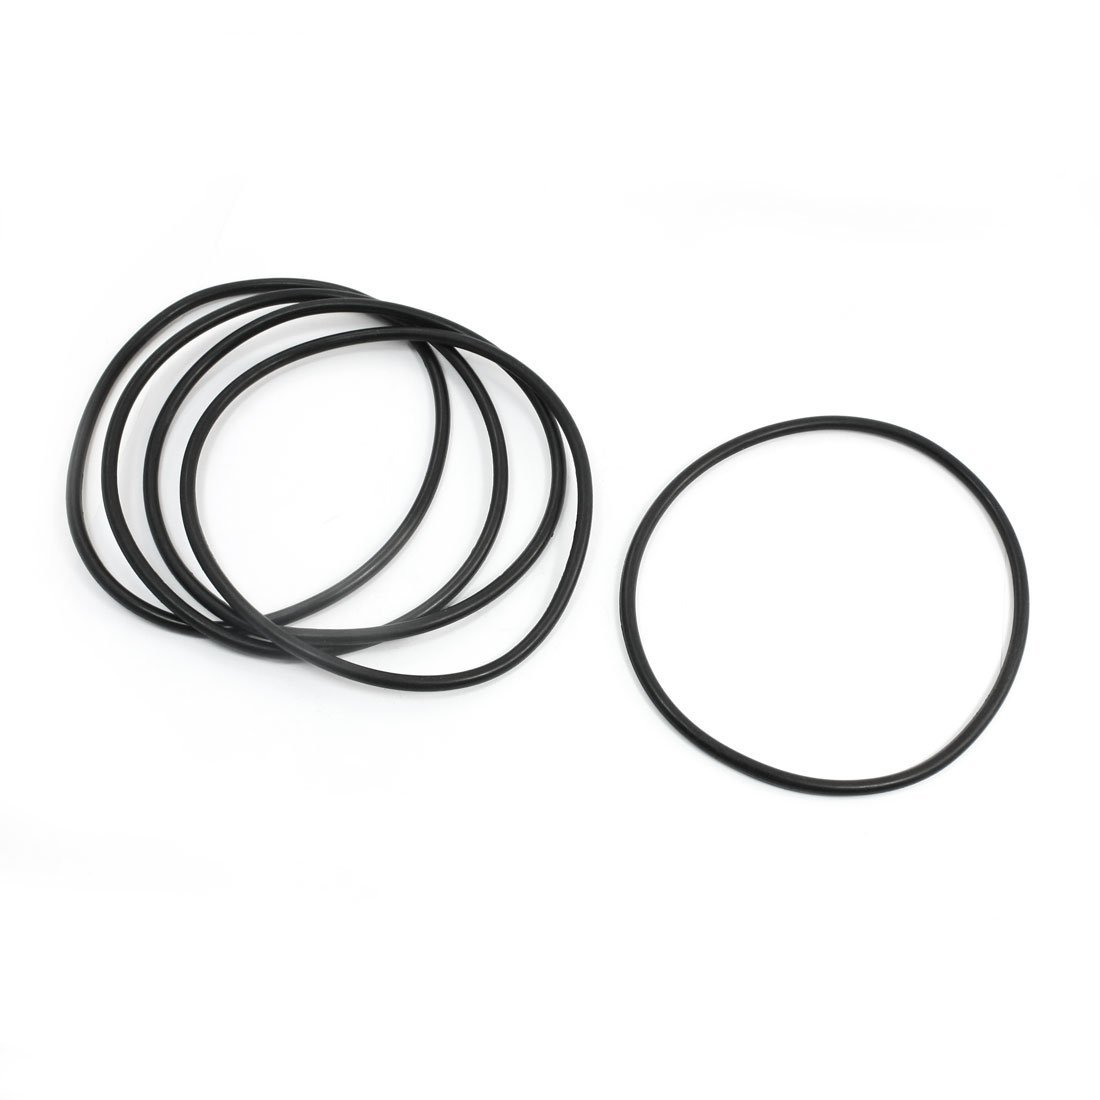 5 Pcs Flexible Rubber O Ring Seal Washer Gasket Black 135mm x 5mm DealMux DLM-B00LGJ3FHE